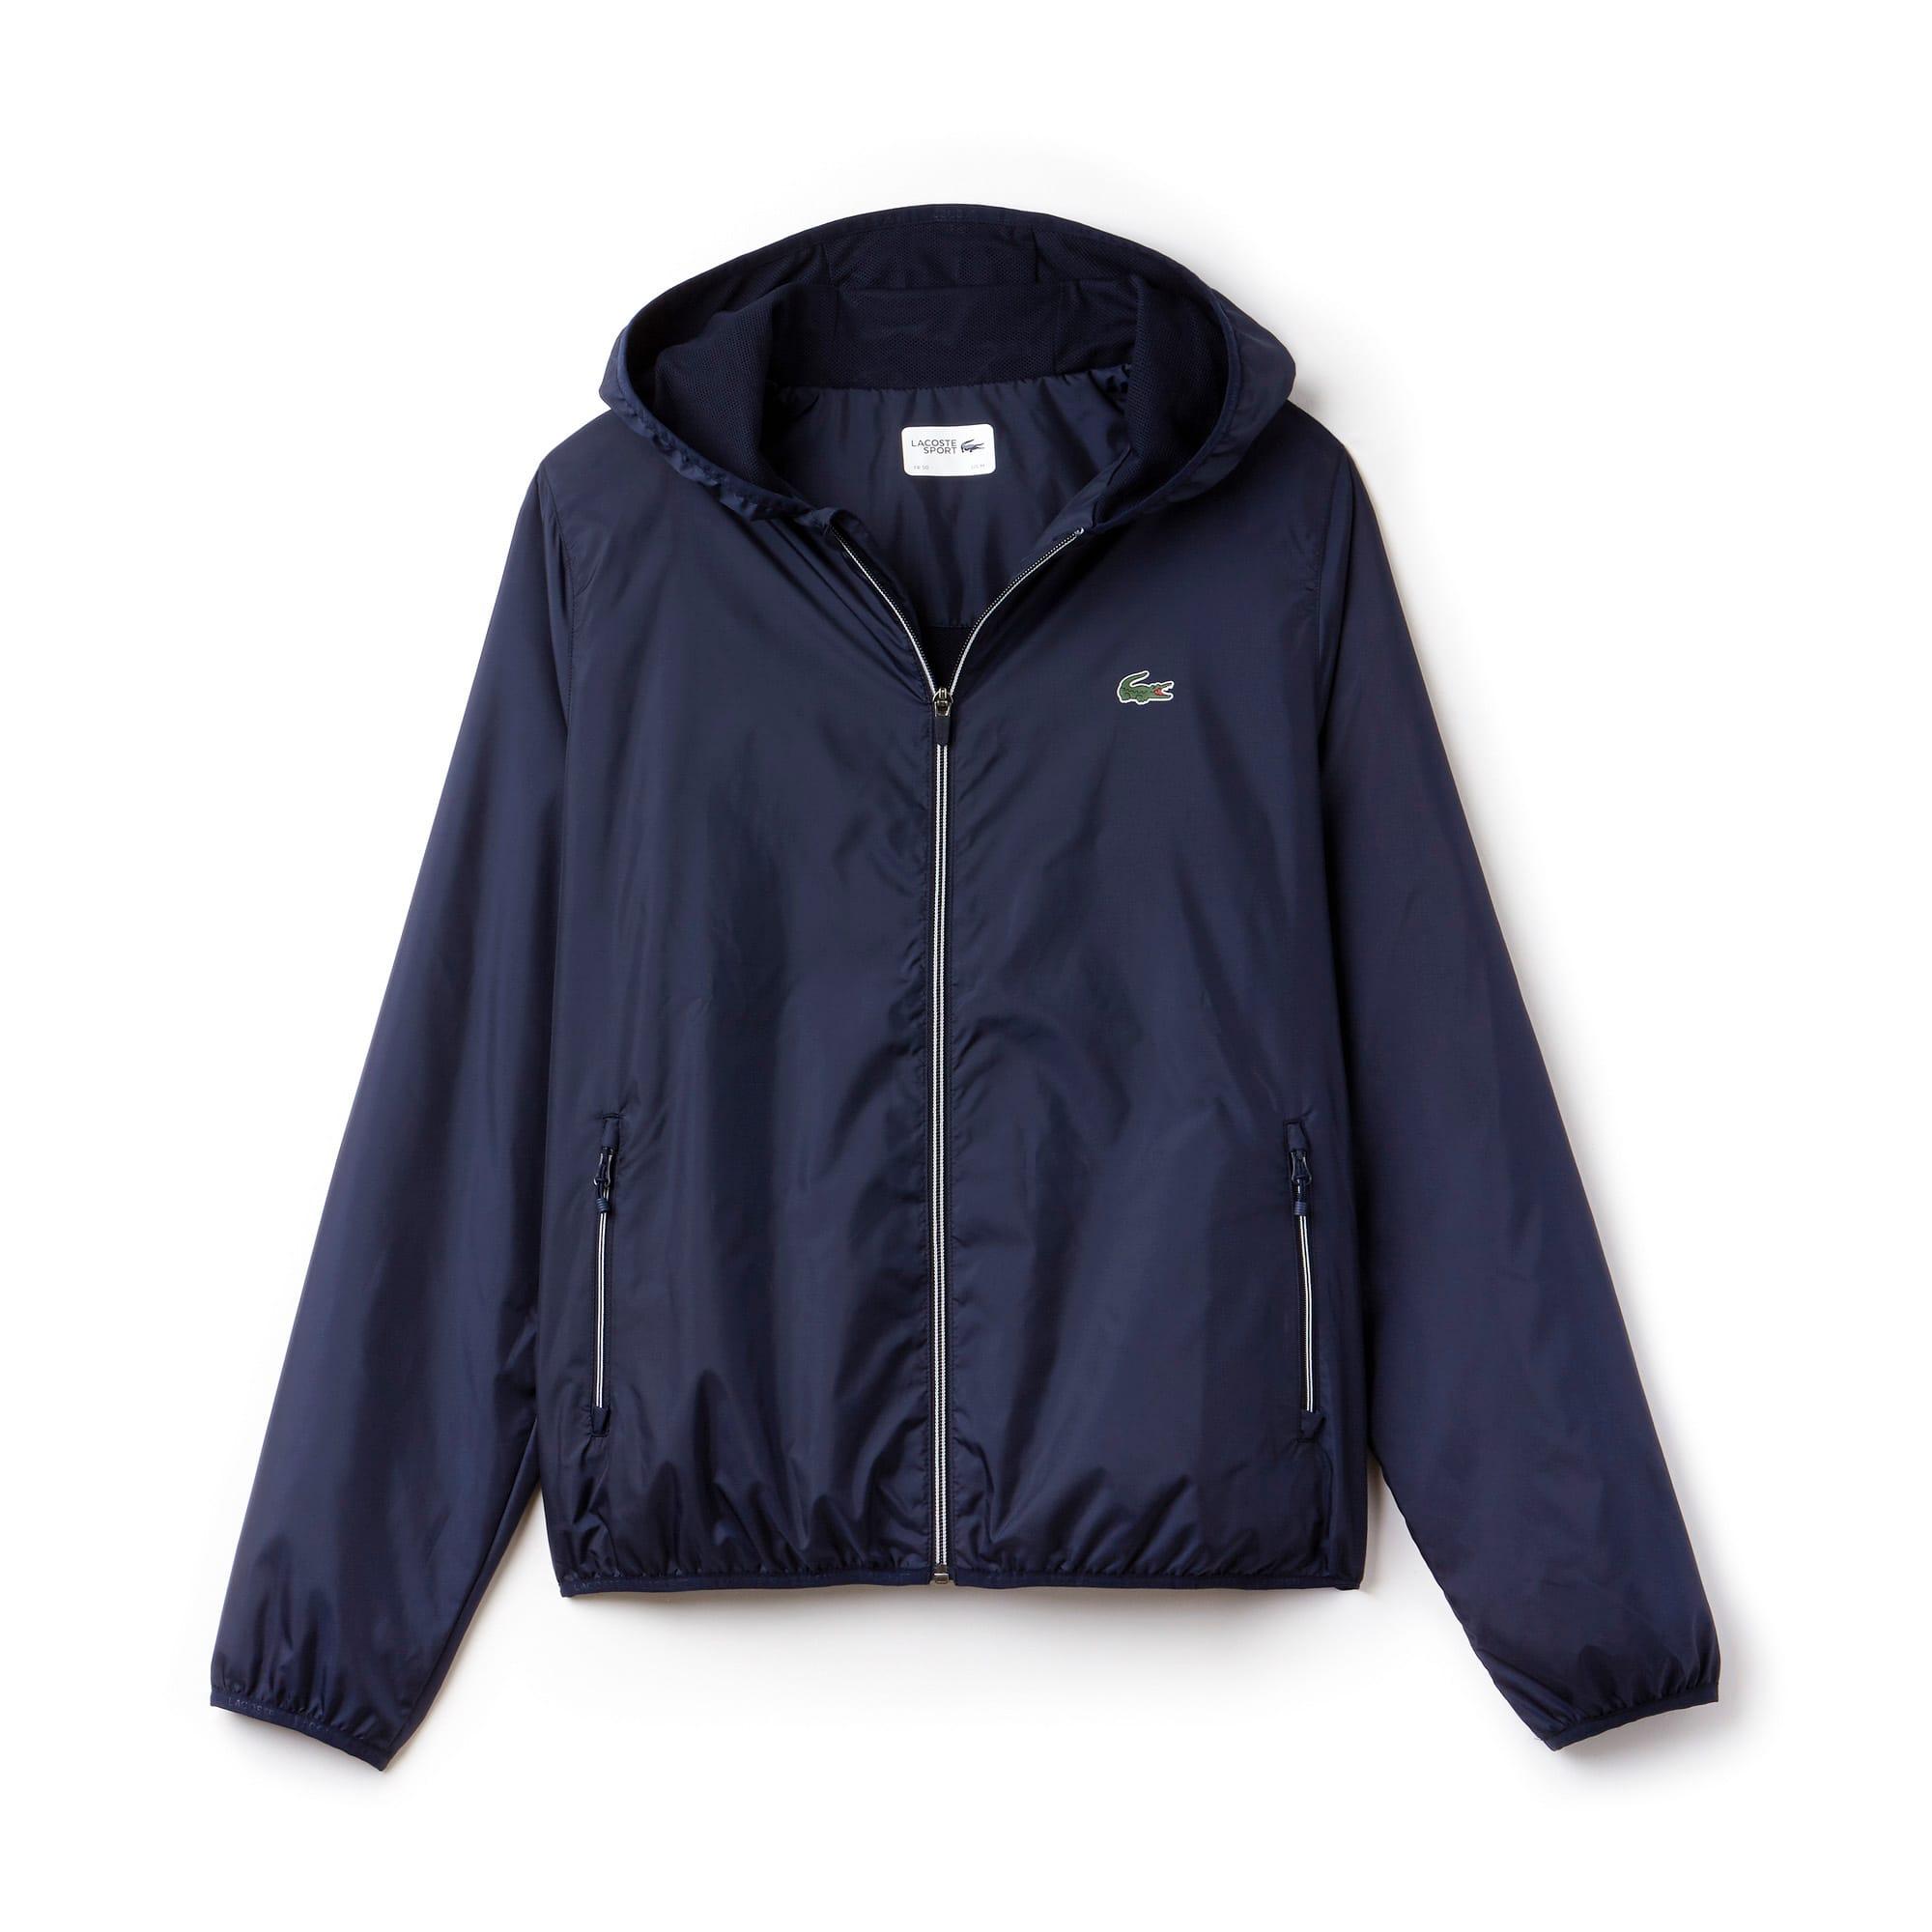 Men's  SPORT Tennis Water-Resistant Hooded Jacket